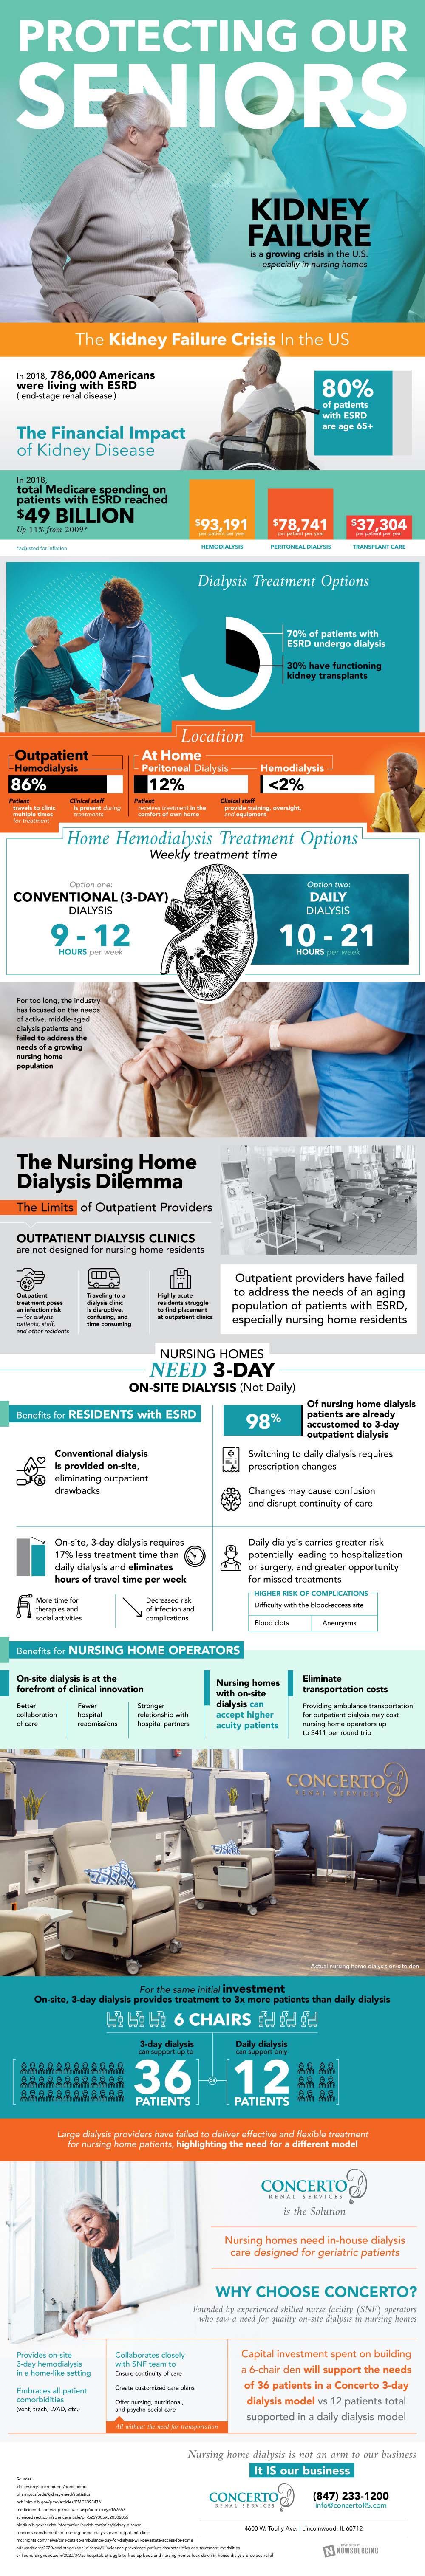 A New Model for Nursing Home Dialysis